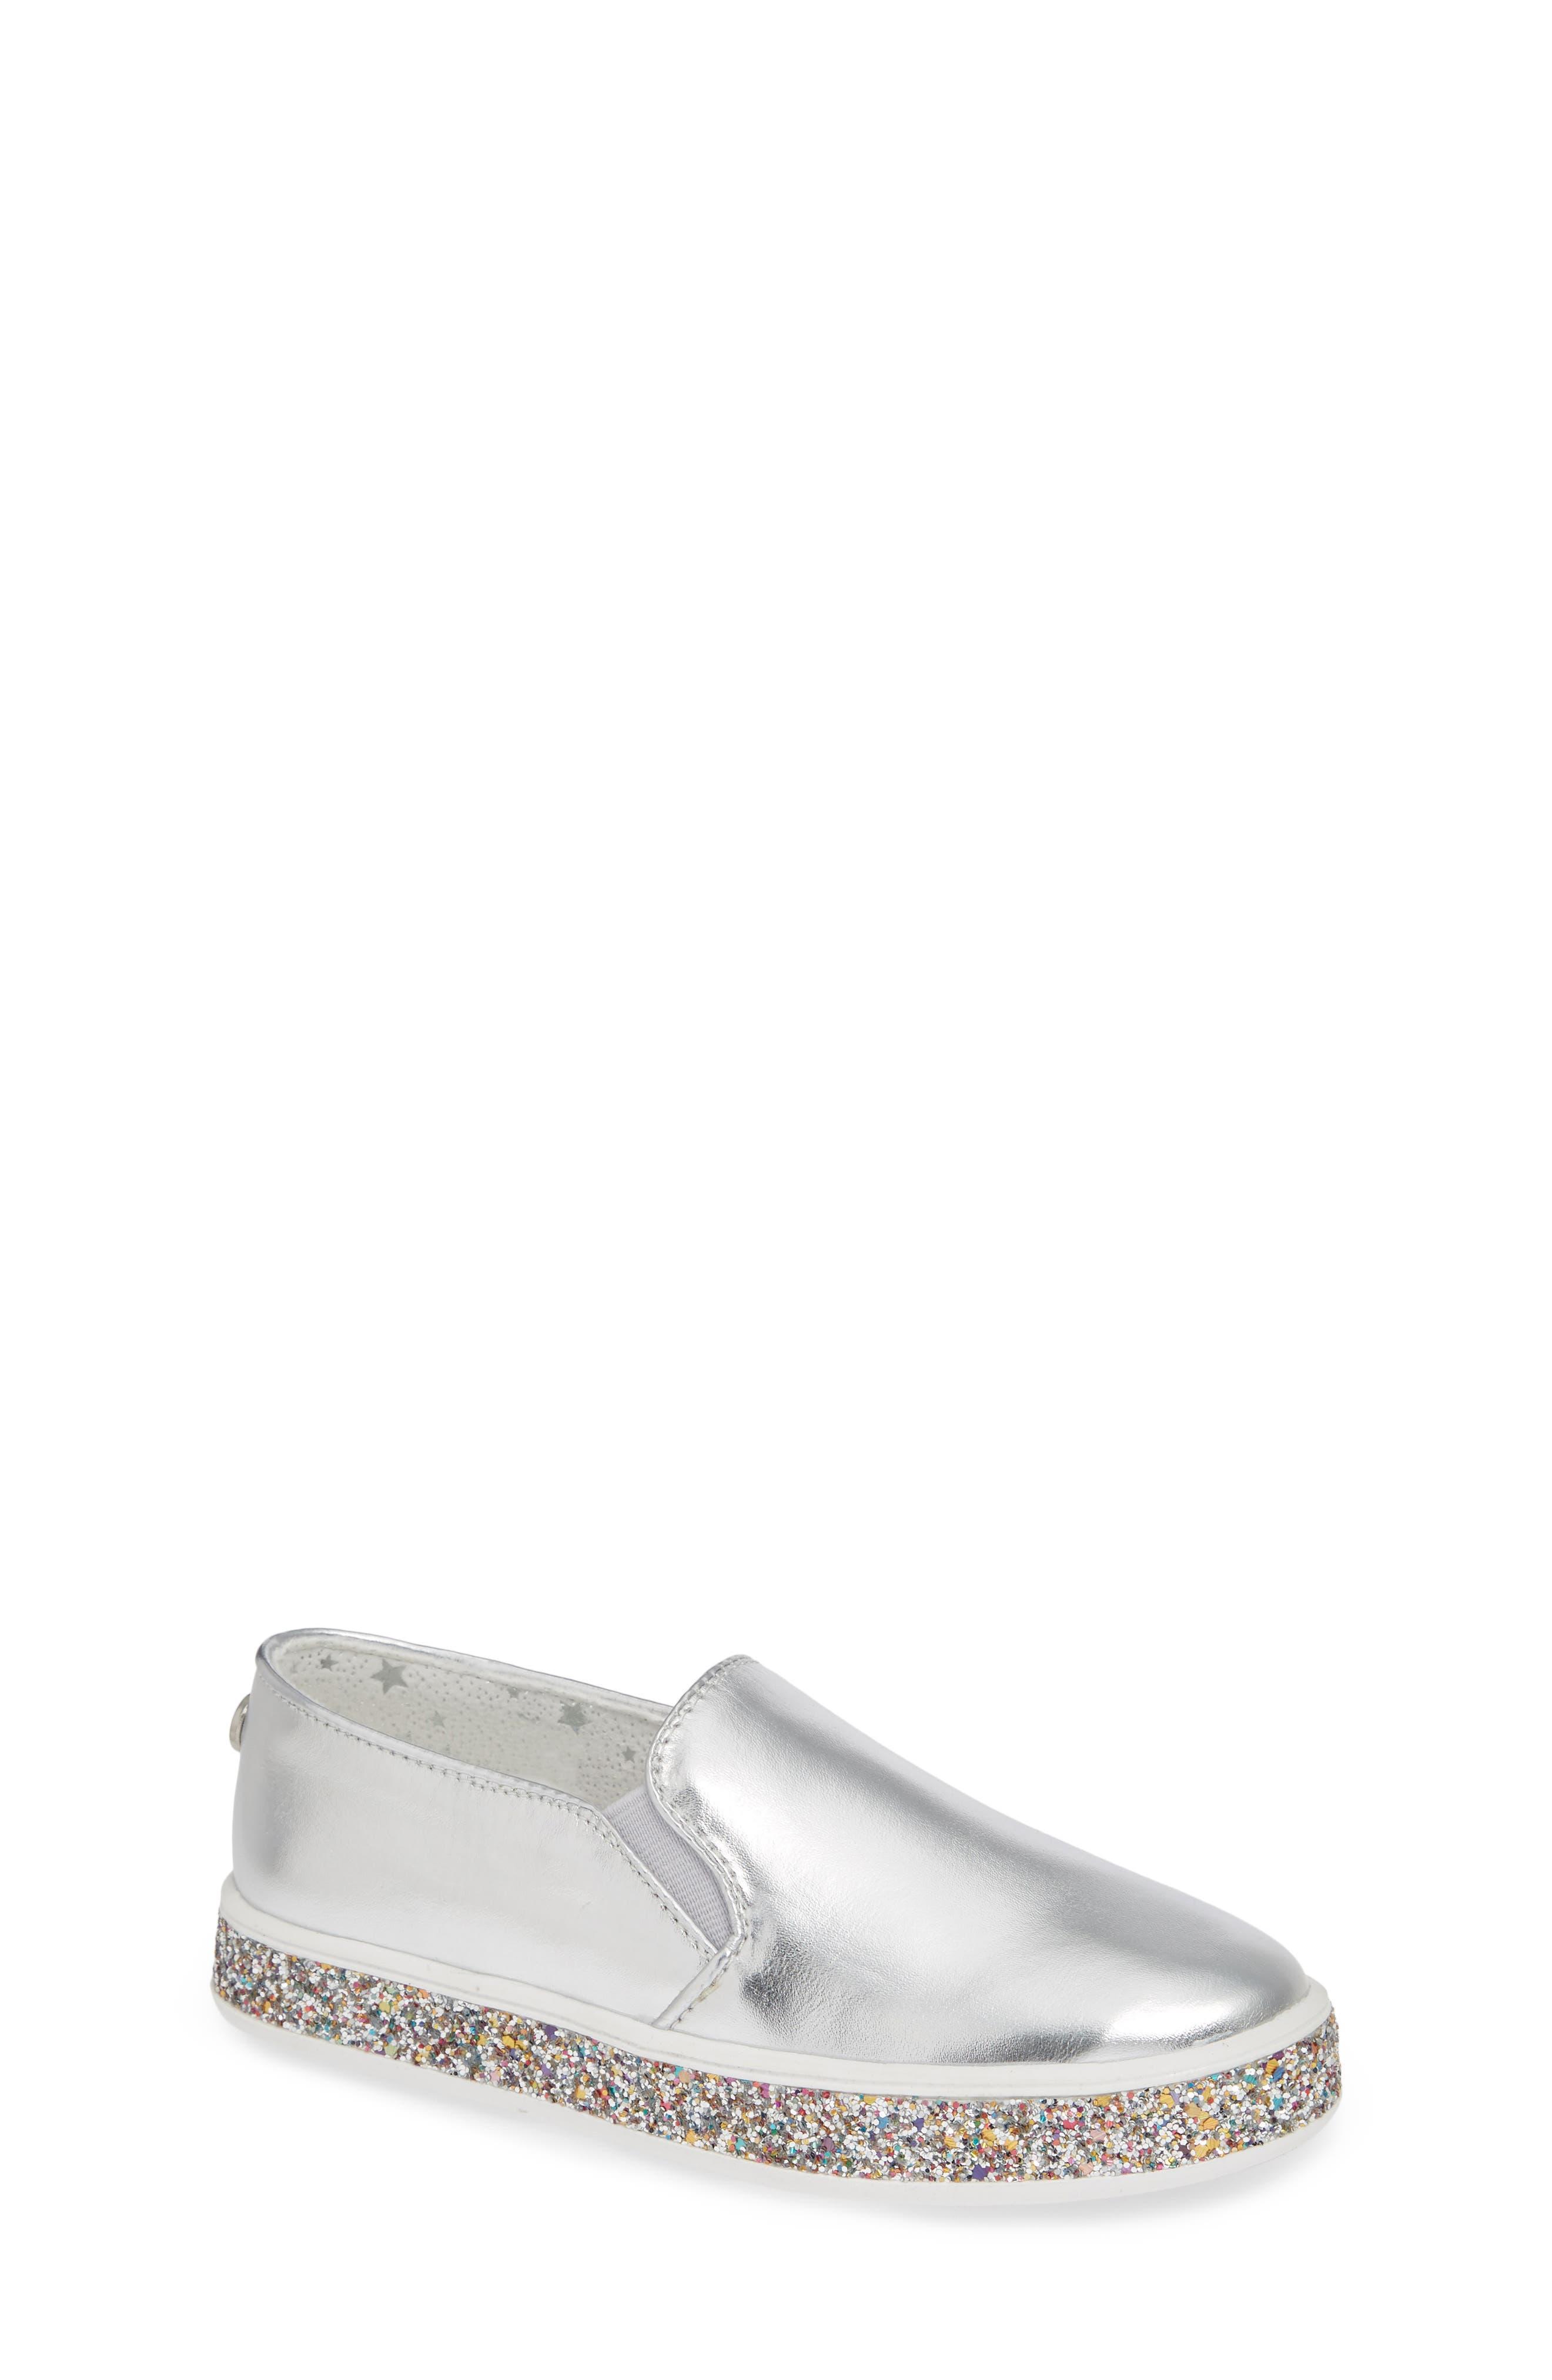 Jglorie Glitter Slip-On Sneaker,                         Main,                         color, SILVER